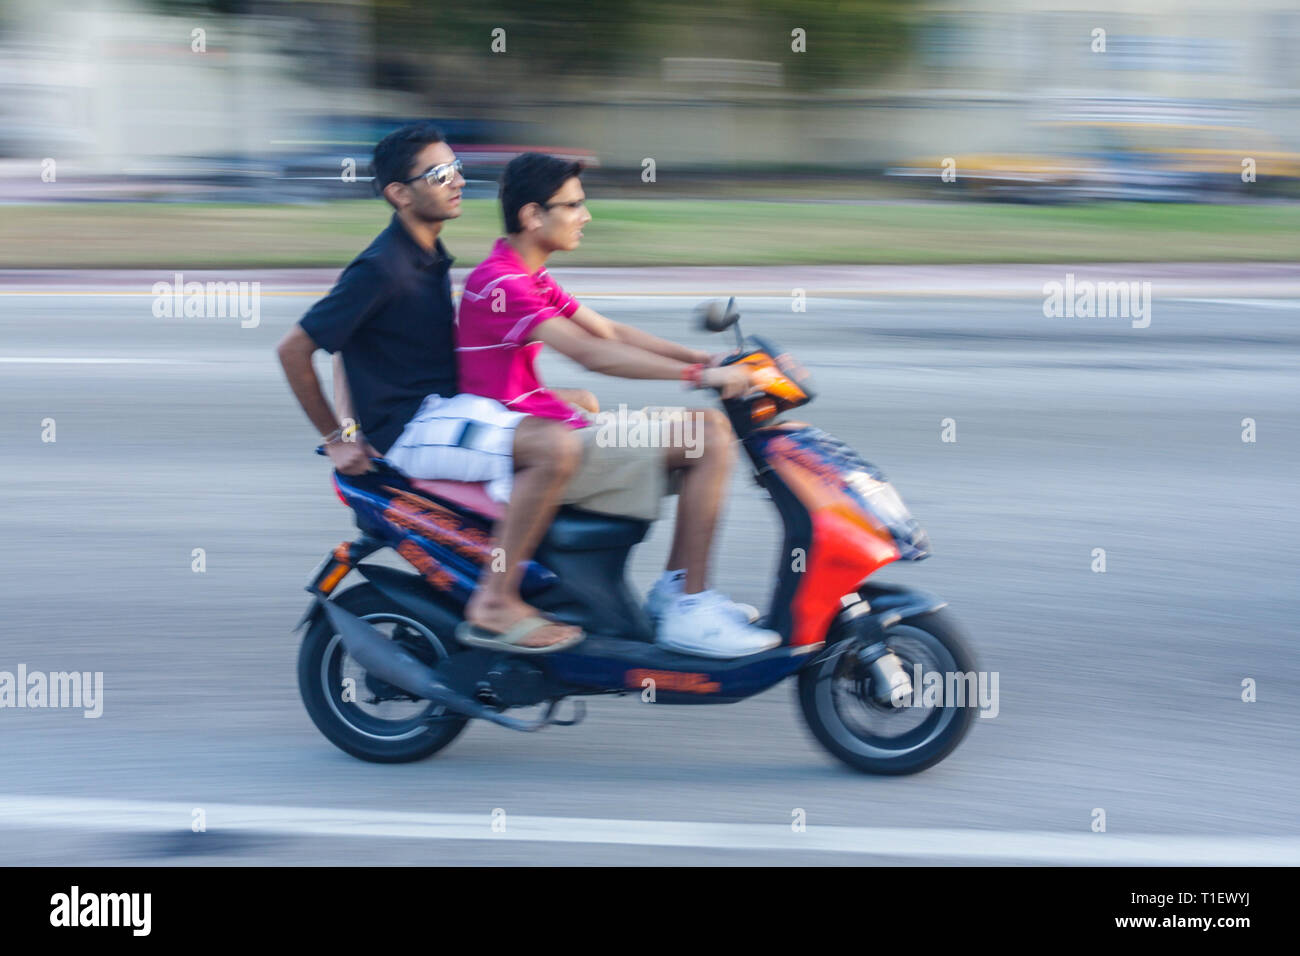 Miami Beach Florida Washington Avenue Asian man men motor scooter moving speed no helmet unsafe transportation two wheels rent - Stock Image